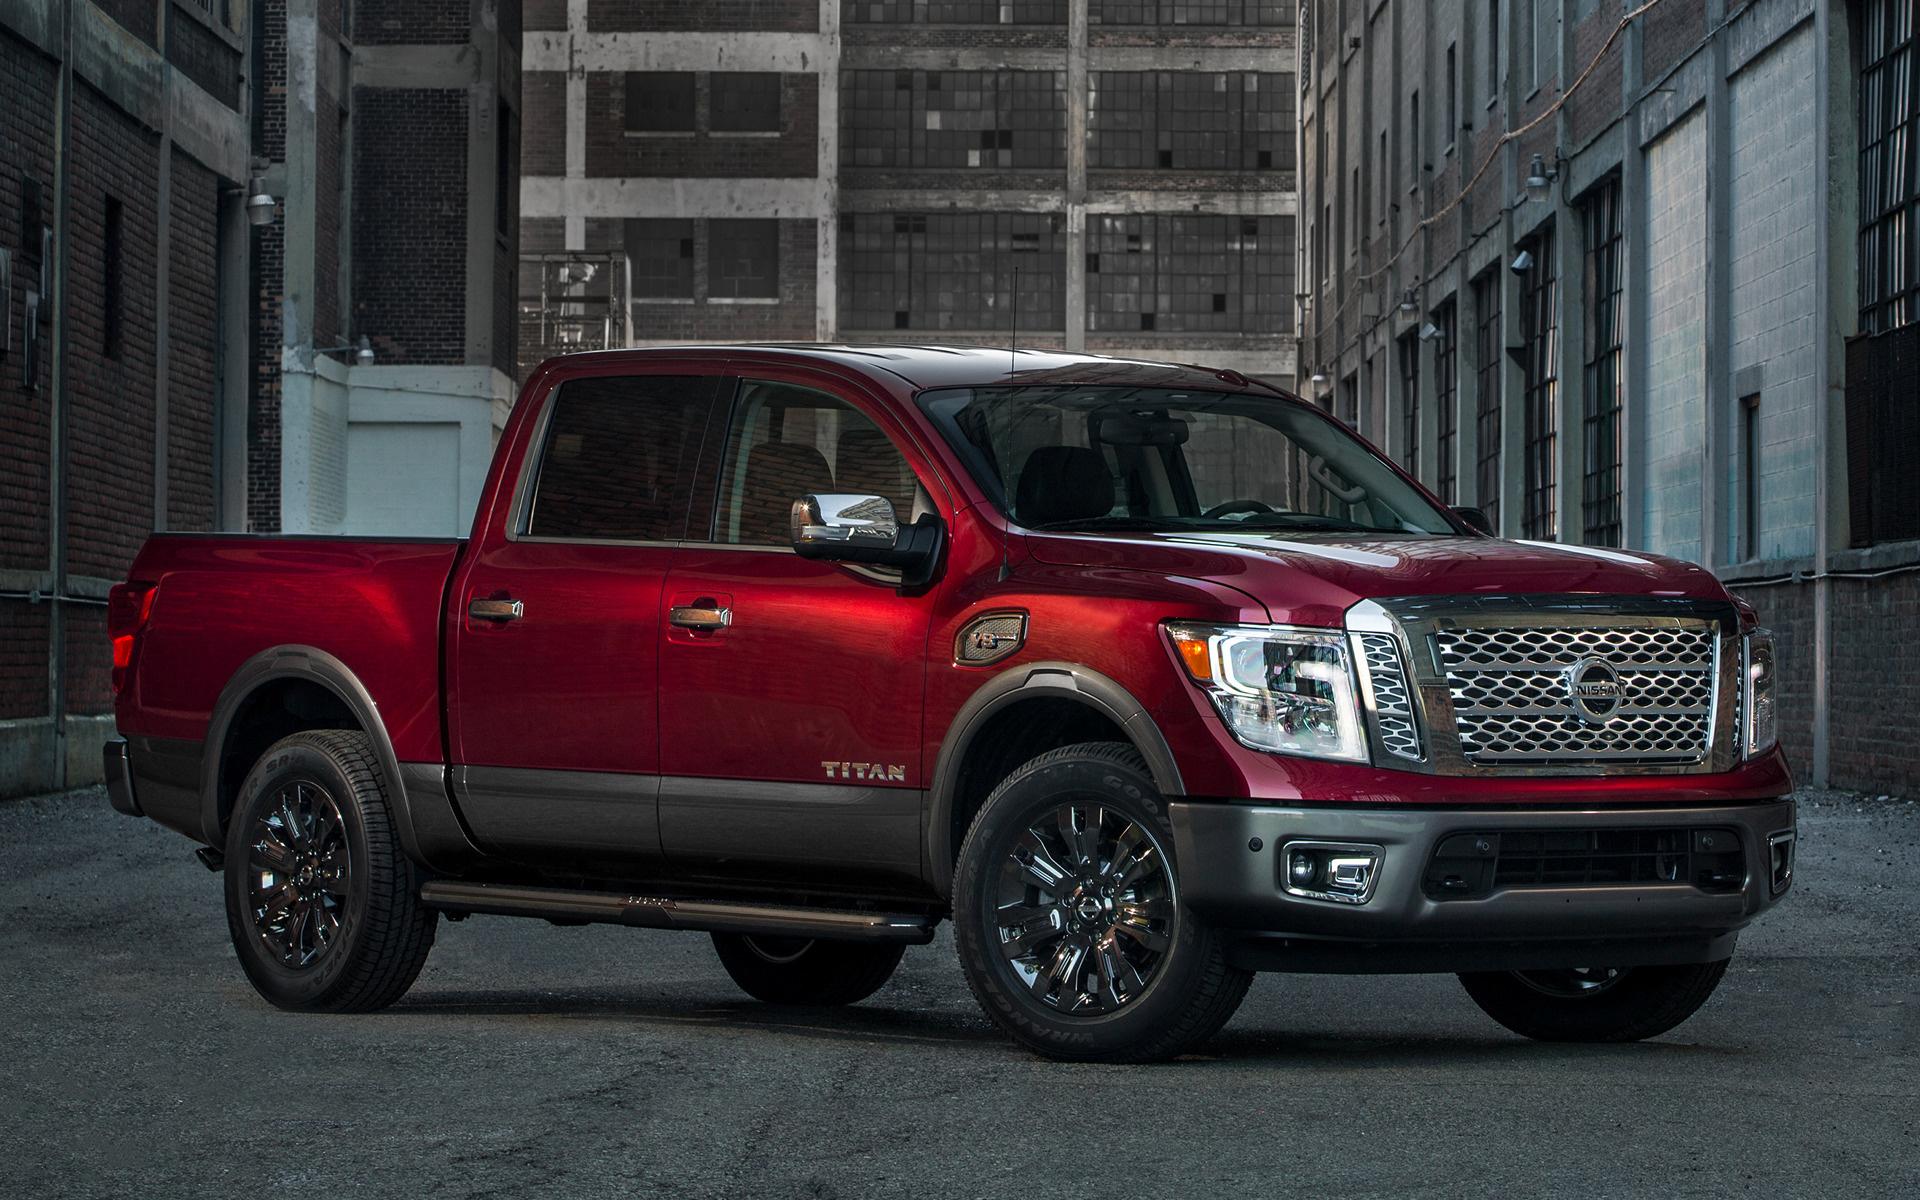 2017 Dodge Ram >> 2017 Nissan Titan Platinum Reserve Crew Cab - Wallpapers and HD Images | Car Pixel